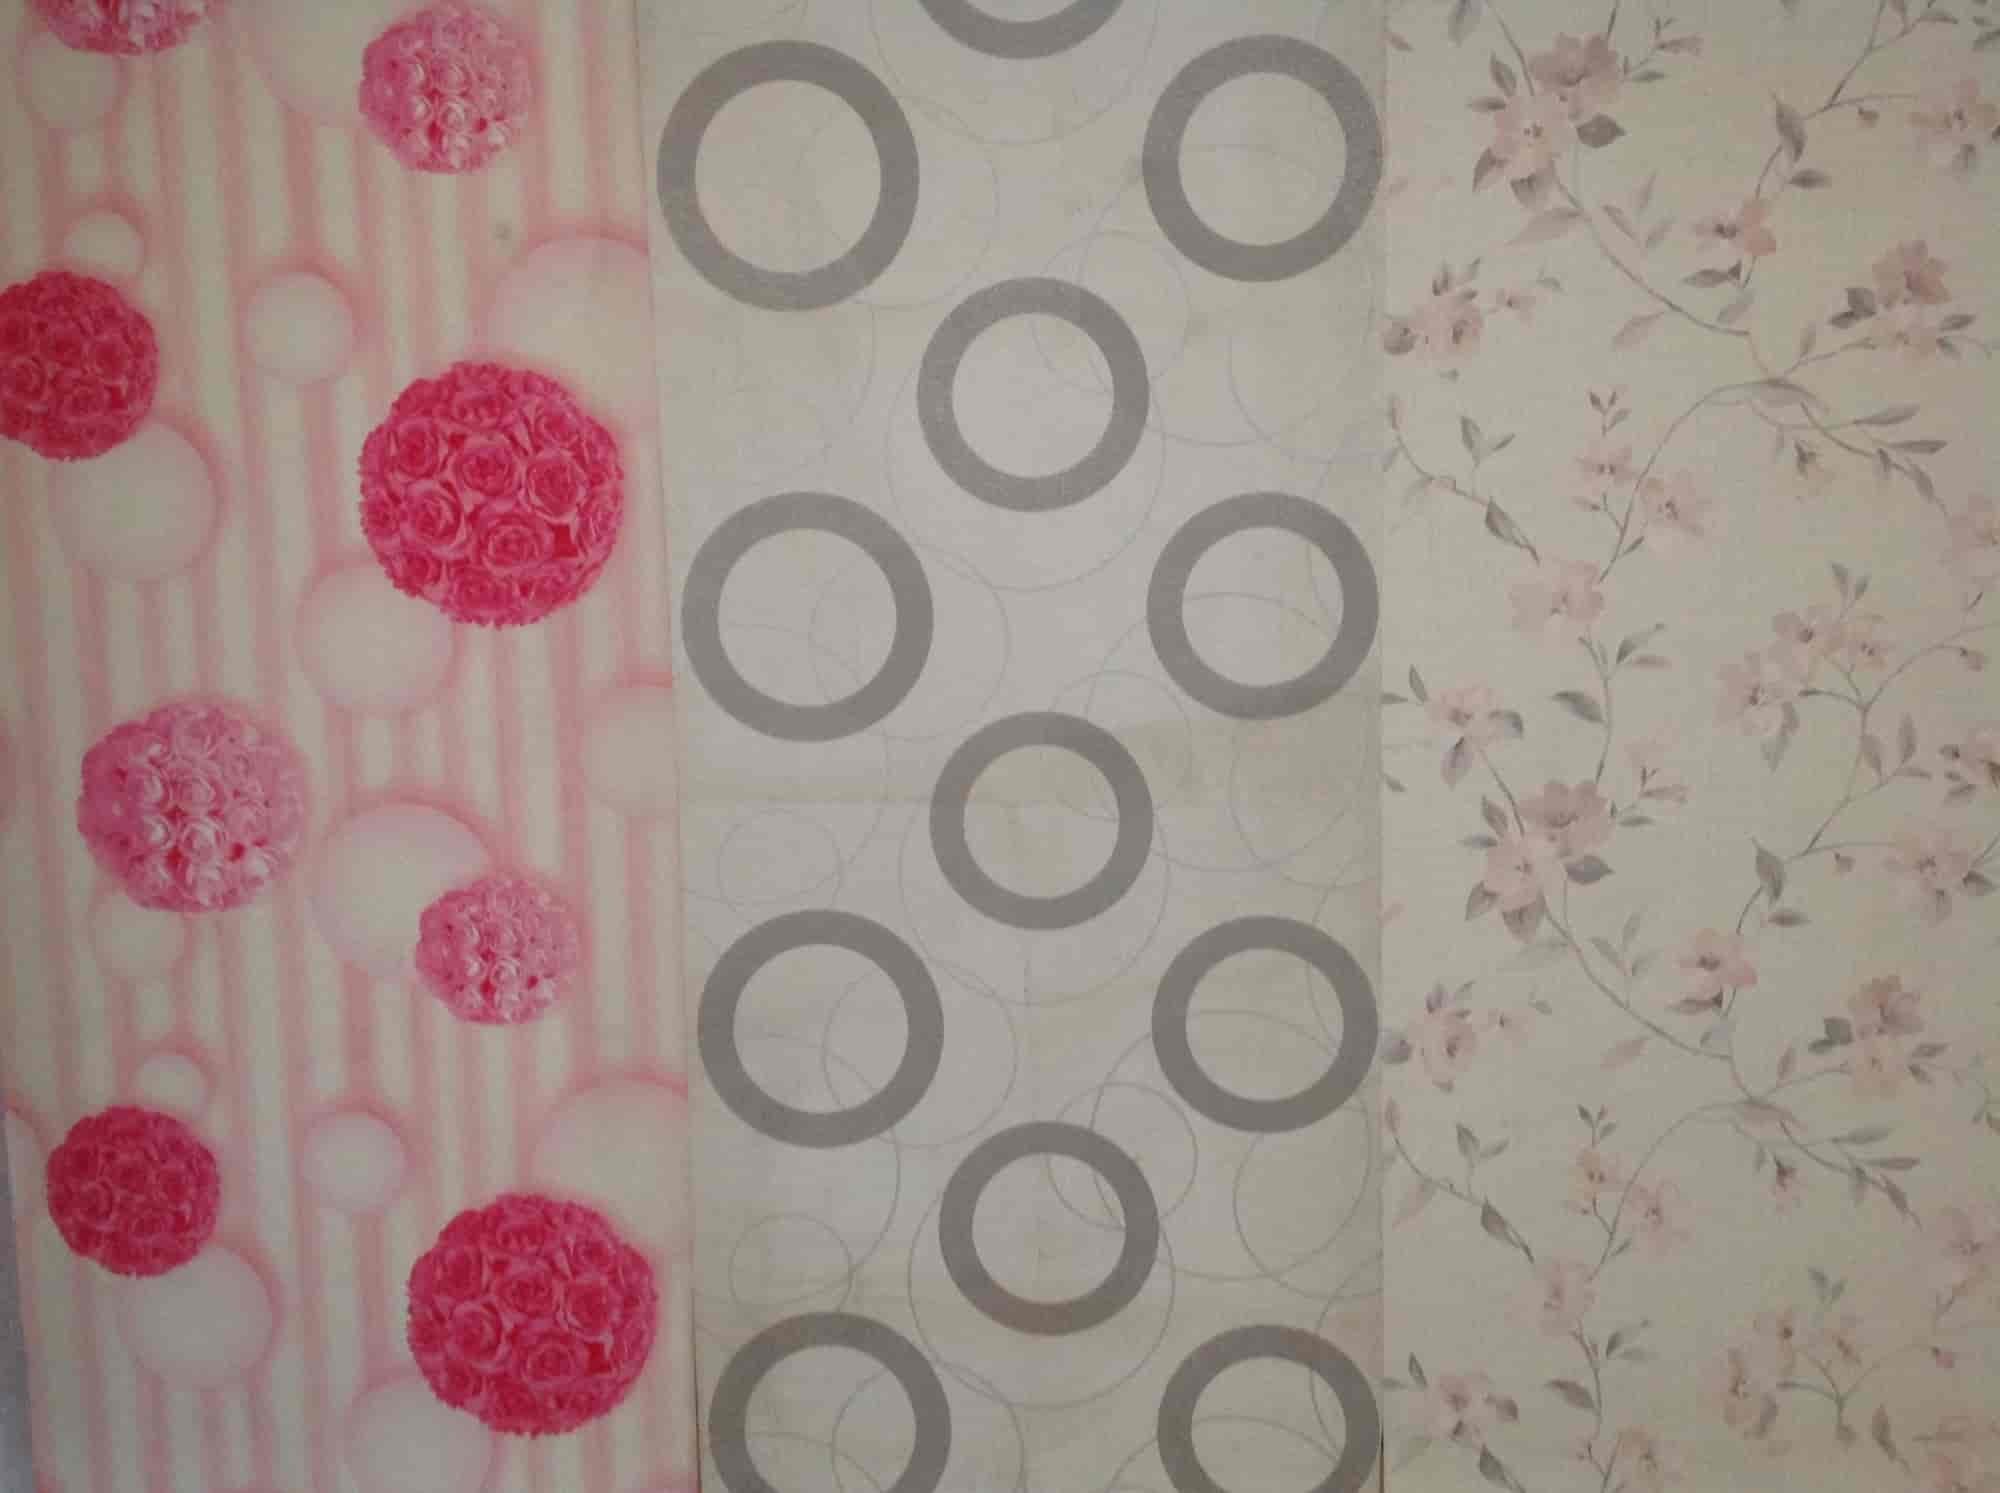 Great Wallpaper Name Sneha - sneha-carpets-and-wallpaper-katraj-pune-wall-paper-dealers-lykmo  Best Photo Reference_446960.jpg